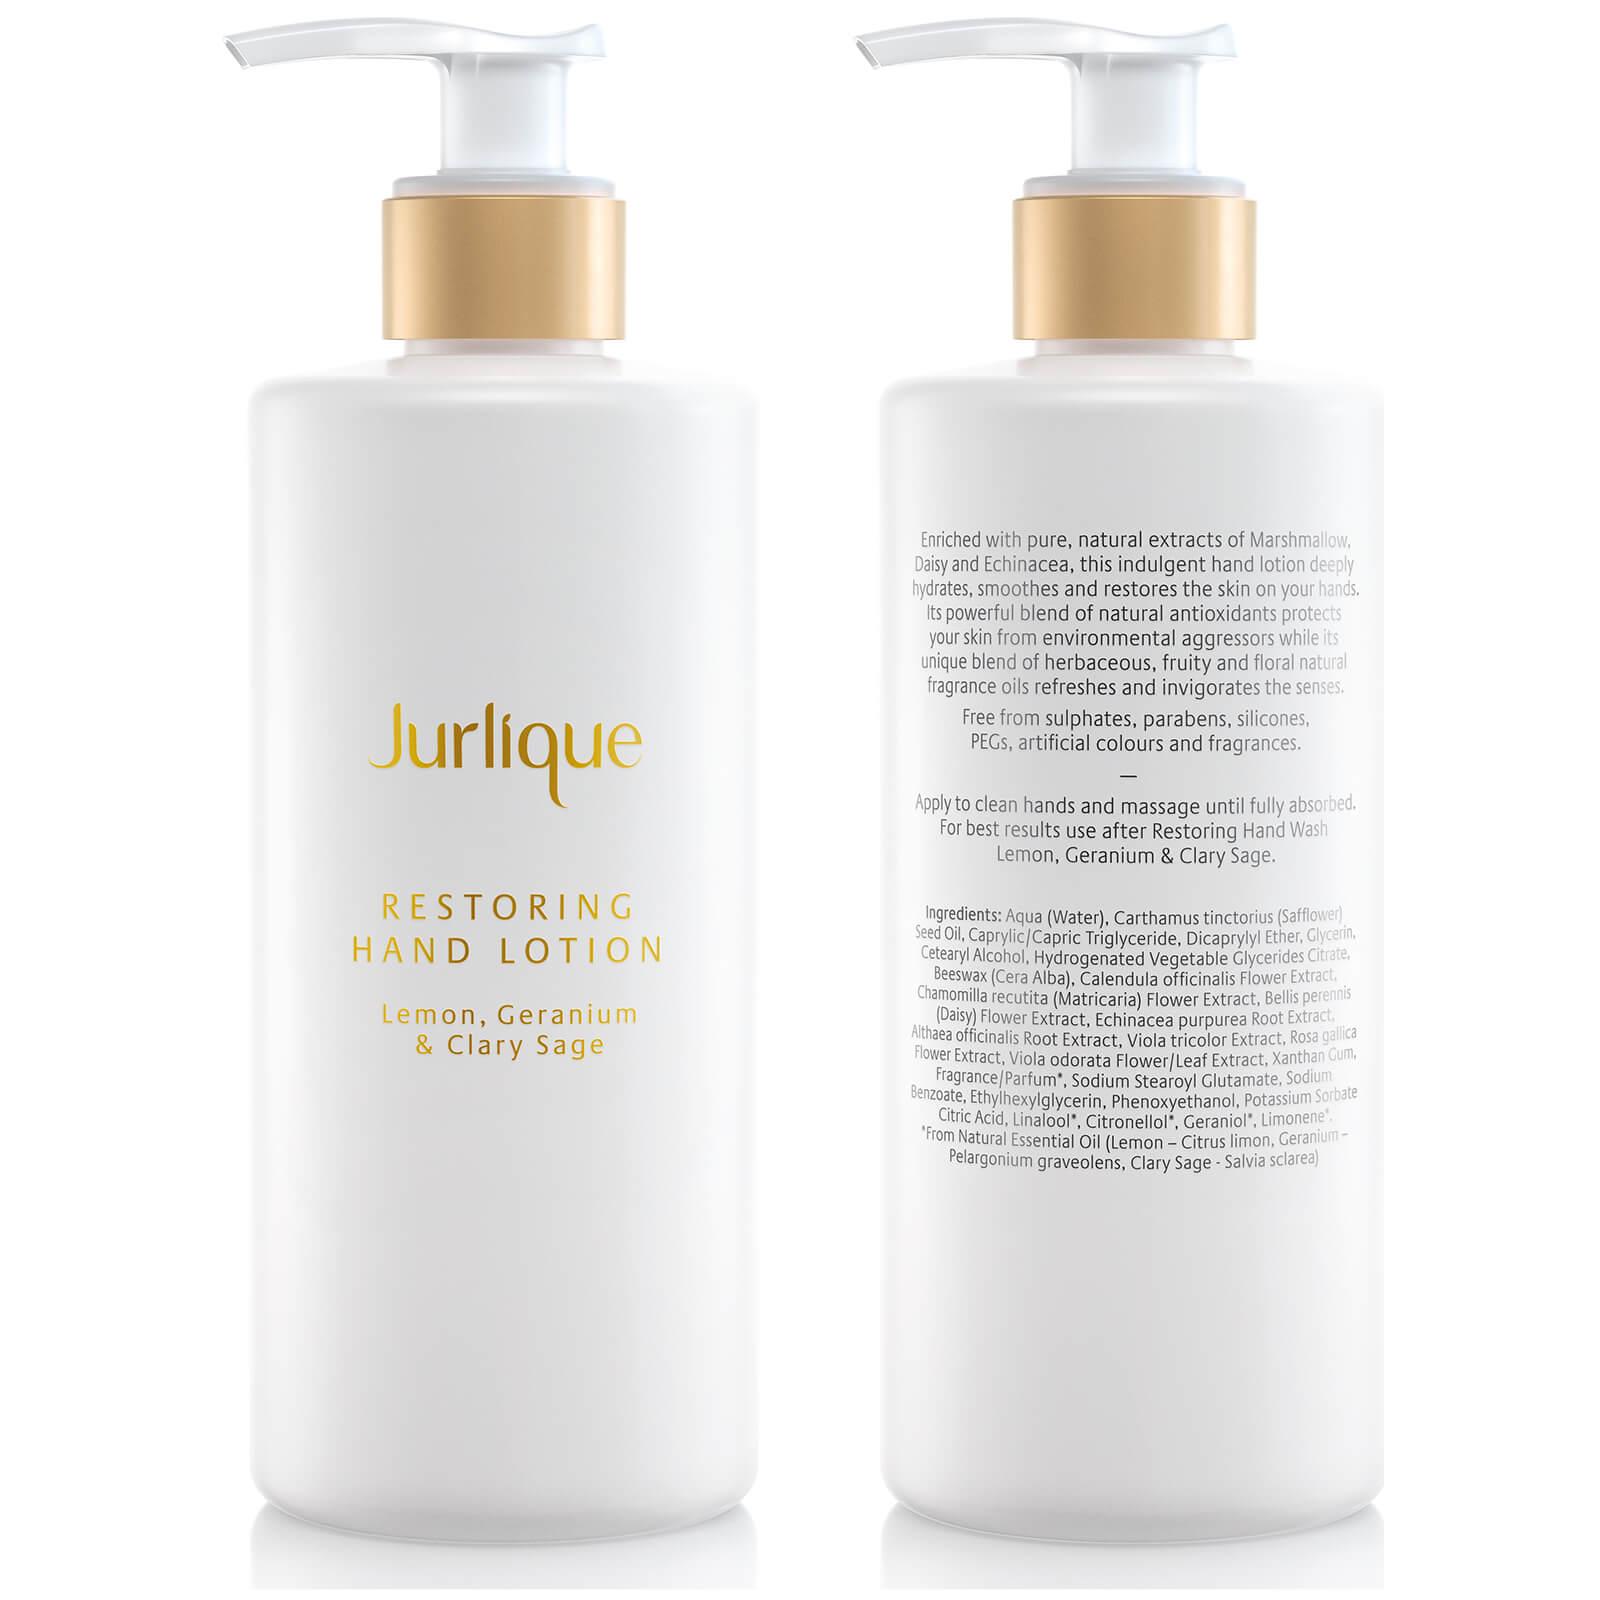 jurlique restoring lemon, geranium and clary sage hand lotion 300ml